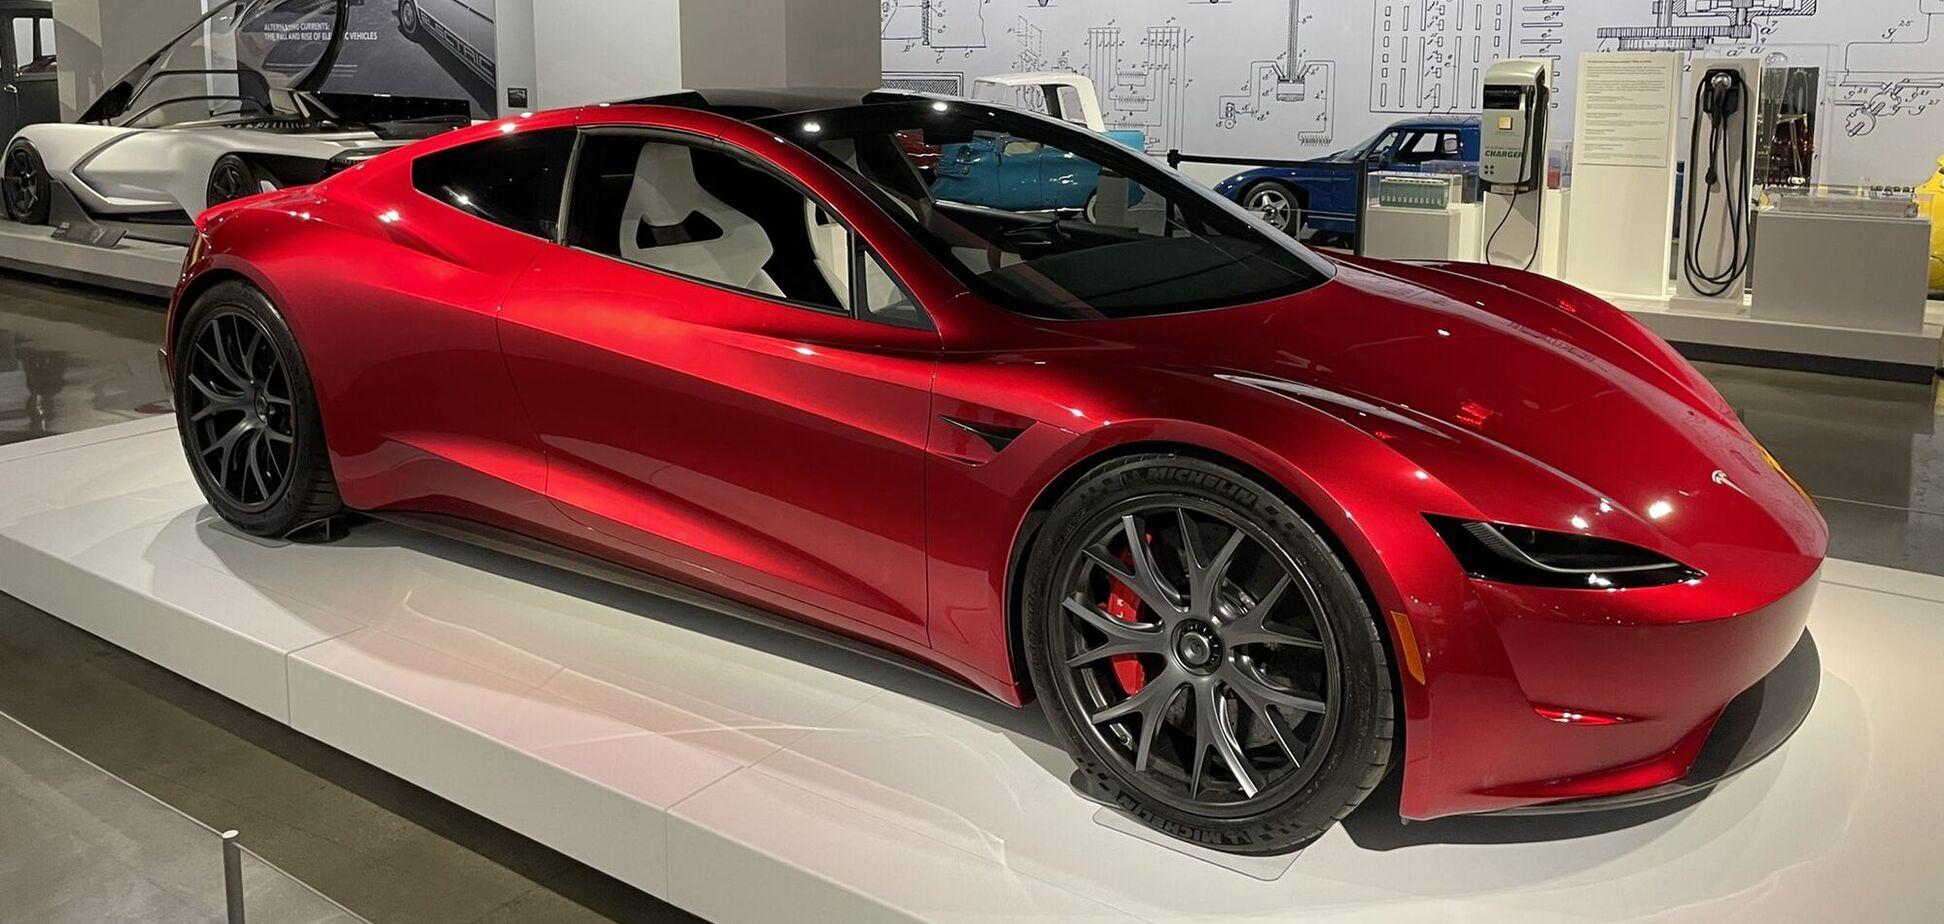 Разгон 0-96 км/ч у Tesla Roadster SpaceX займет 1,1 секунды